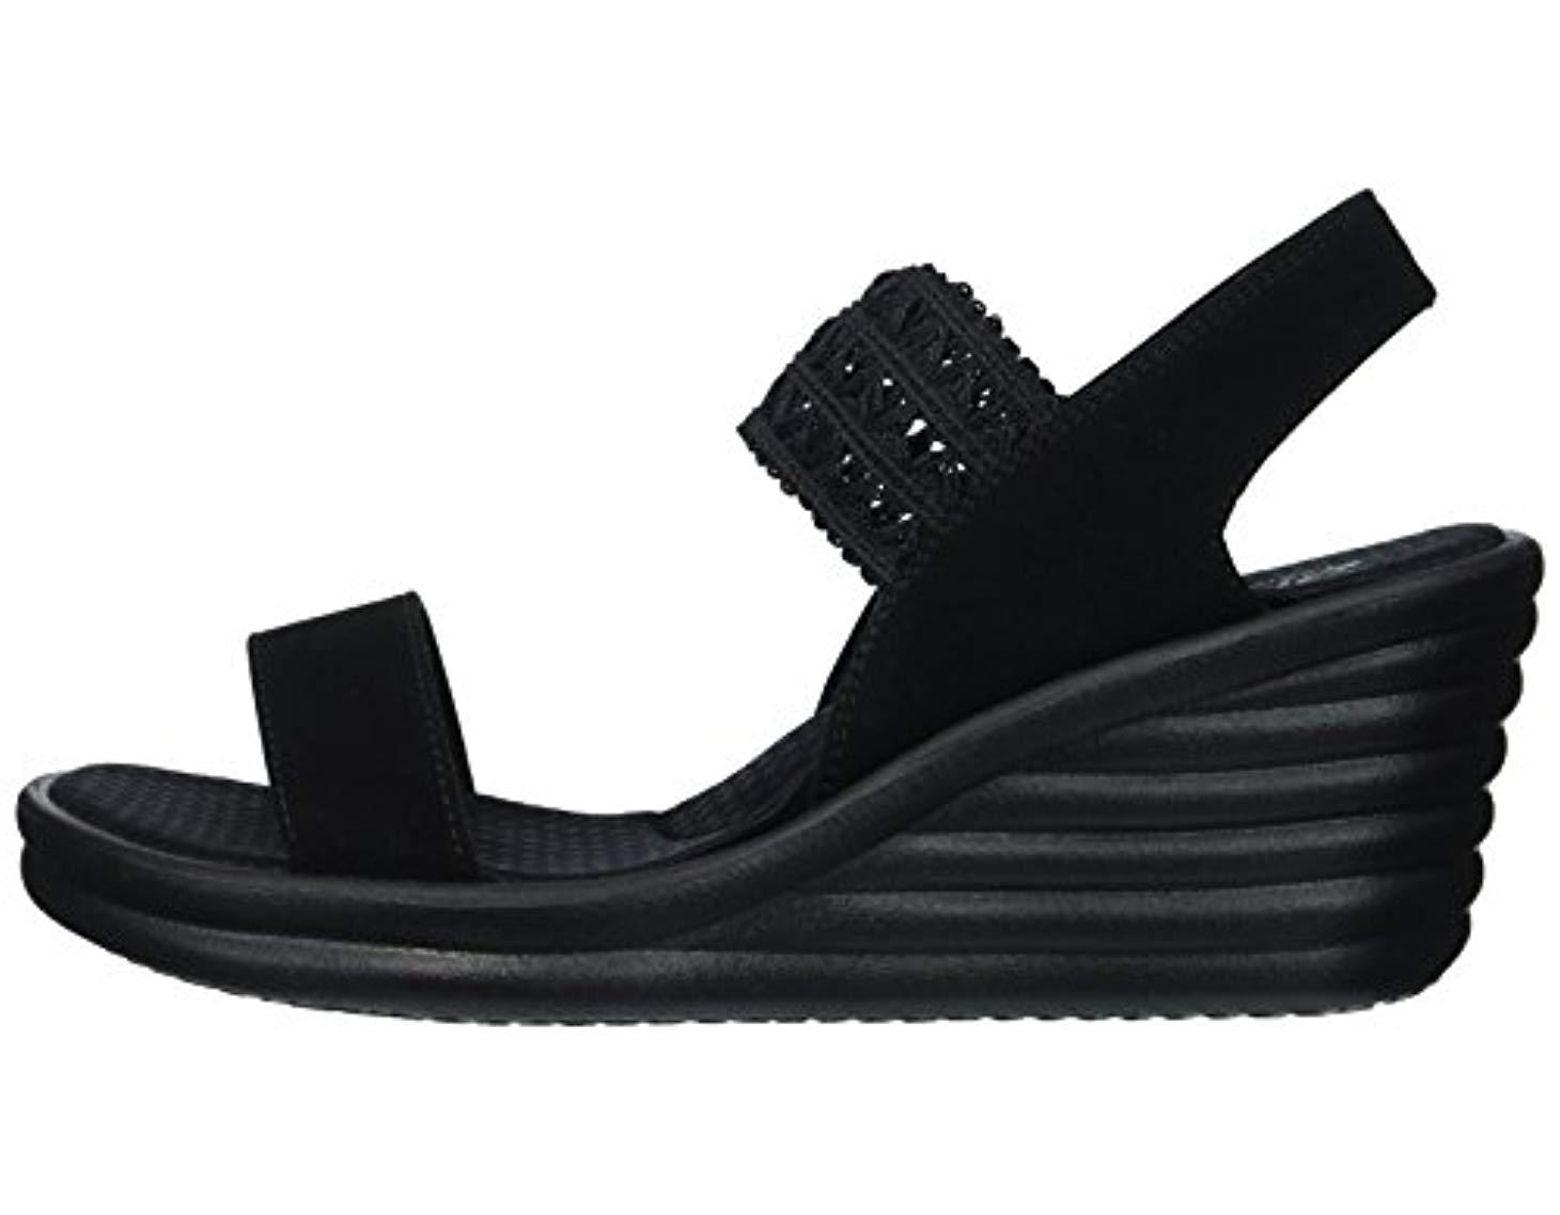 bf356b08e2 Skechers Rumbler Wave-drama Diva Wedge Sandal in Black - Lyst